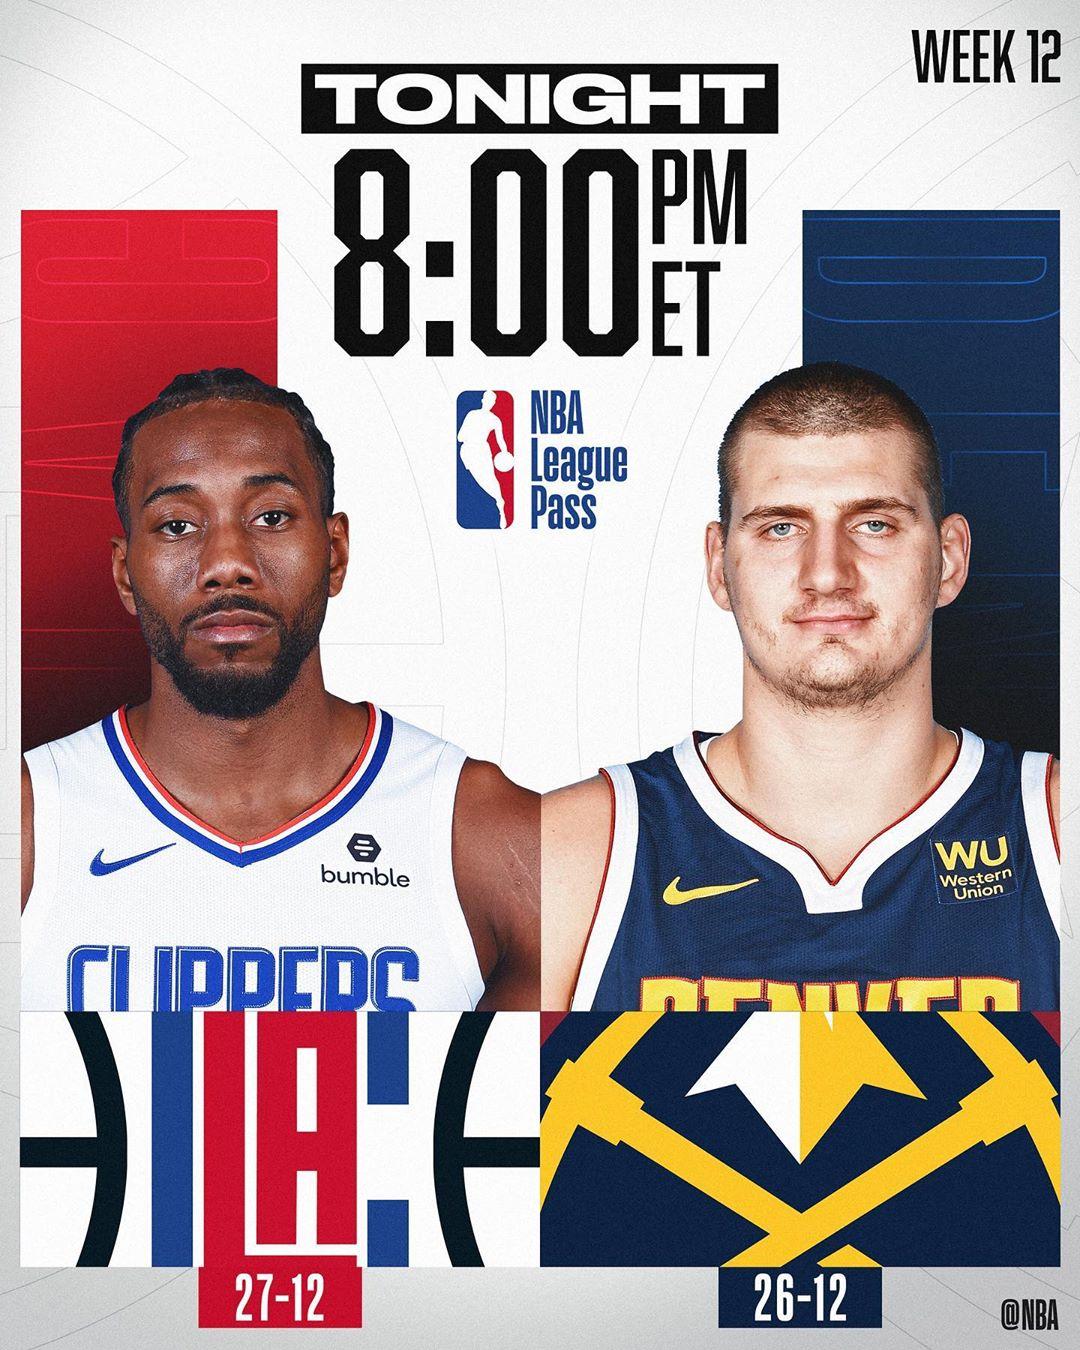 The KLAW & the  (27-12) visit the JOKER &  (26-12) TONIGHT on NBA LEAGUE PASS!...